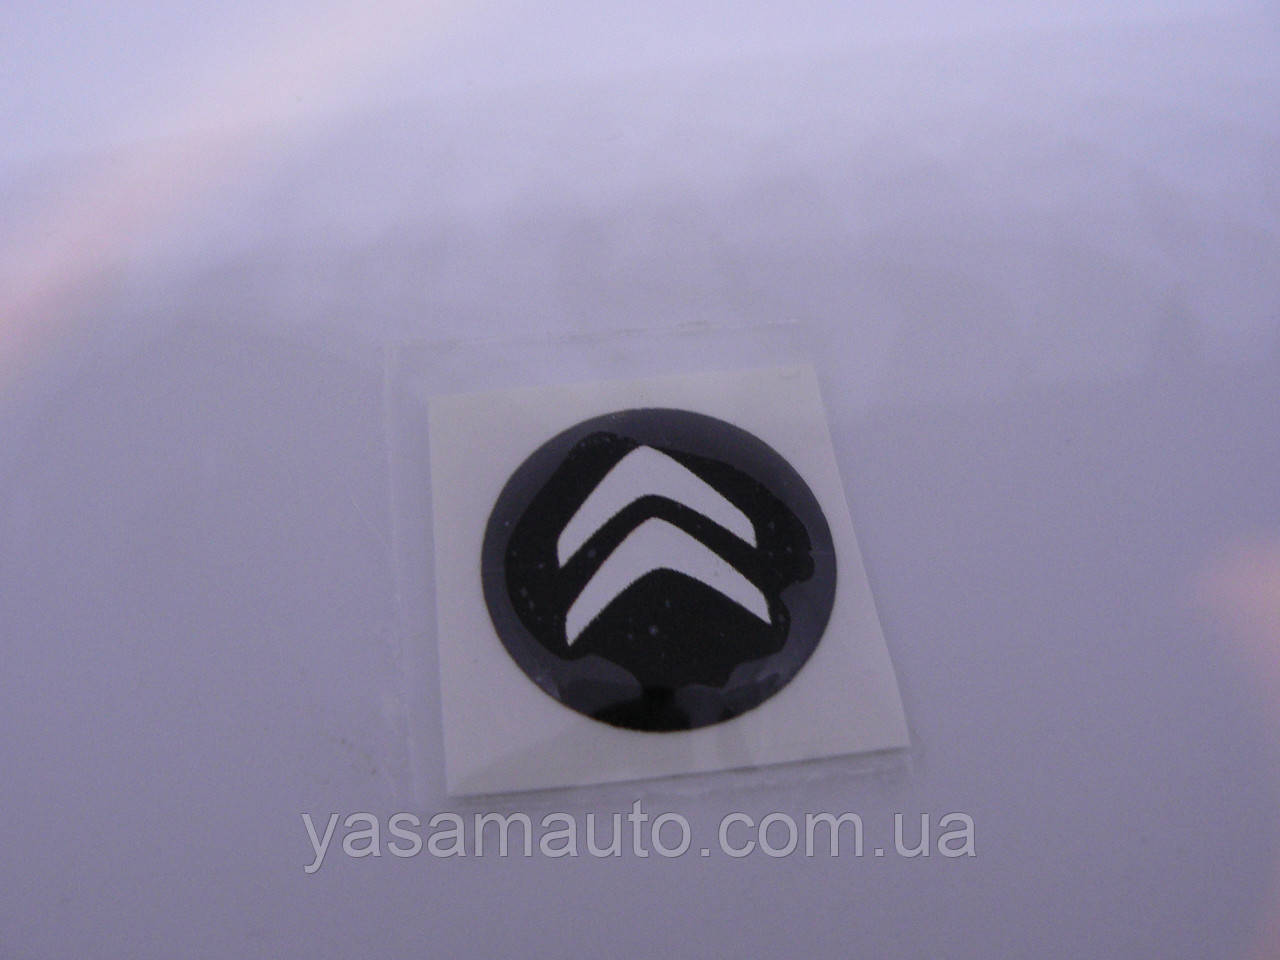 Наклейка s круглая Citroen 20х20х1.2мм силиконовая эмблема логотип марка бренд в круге на авто Ситроен